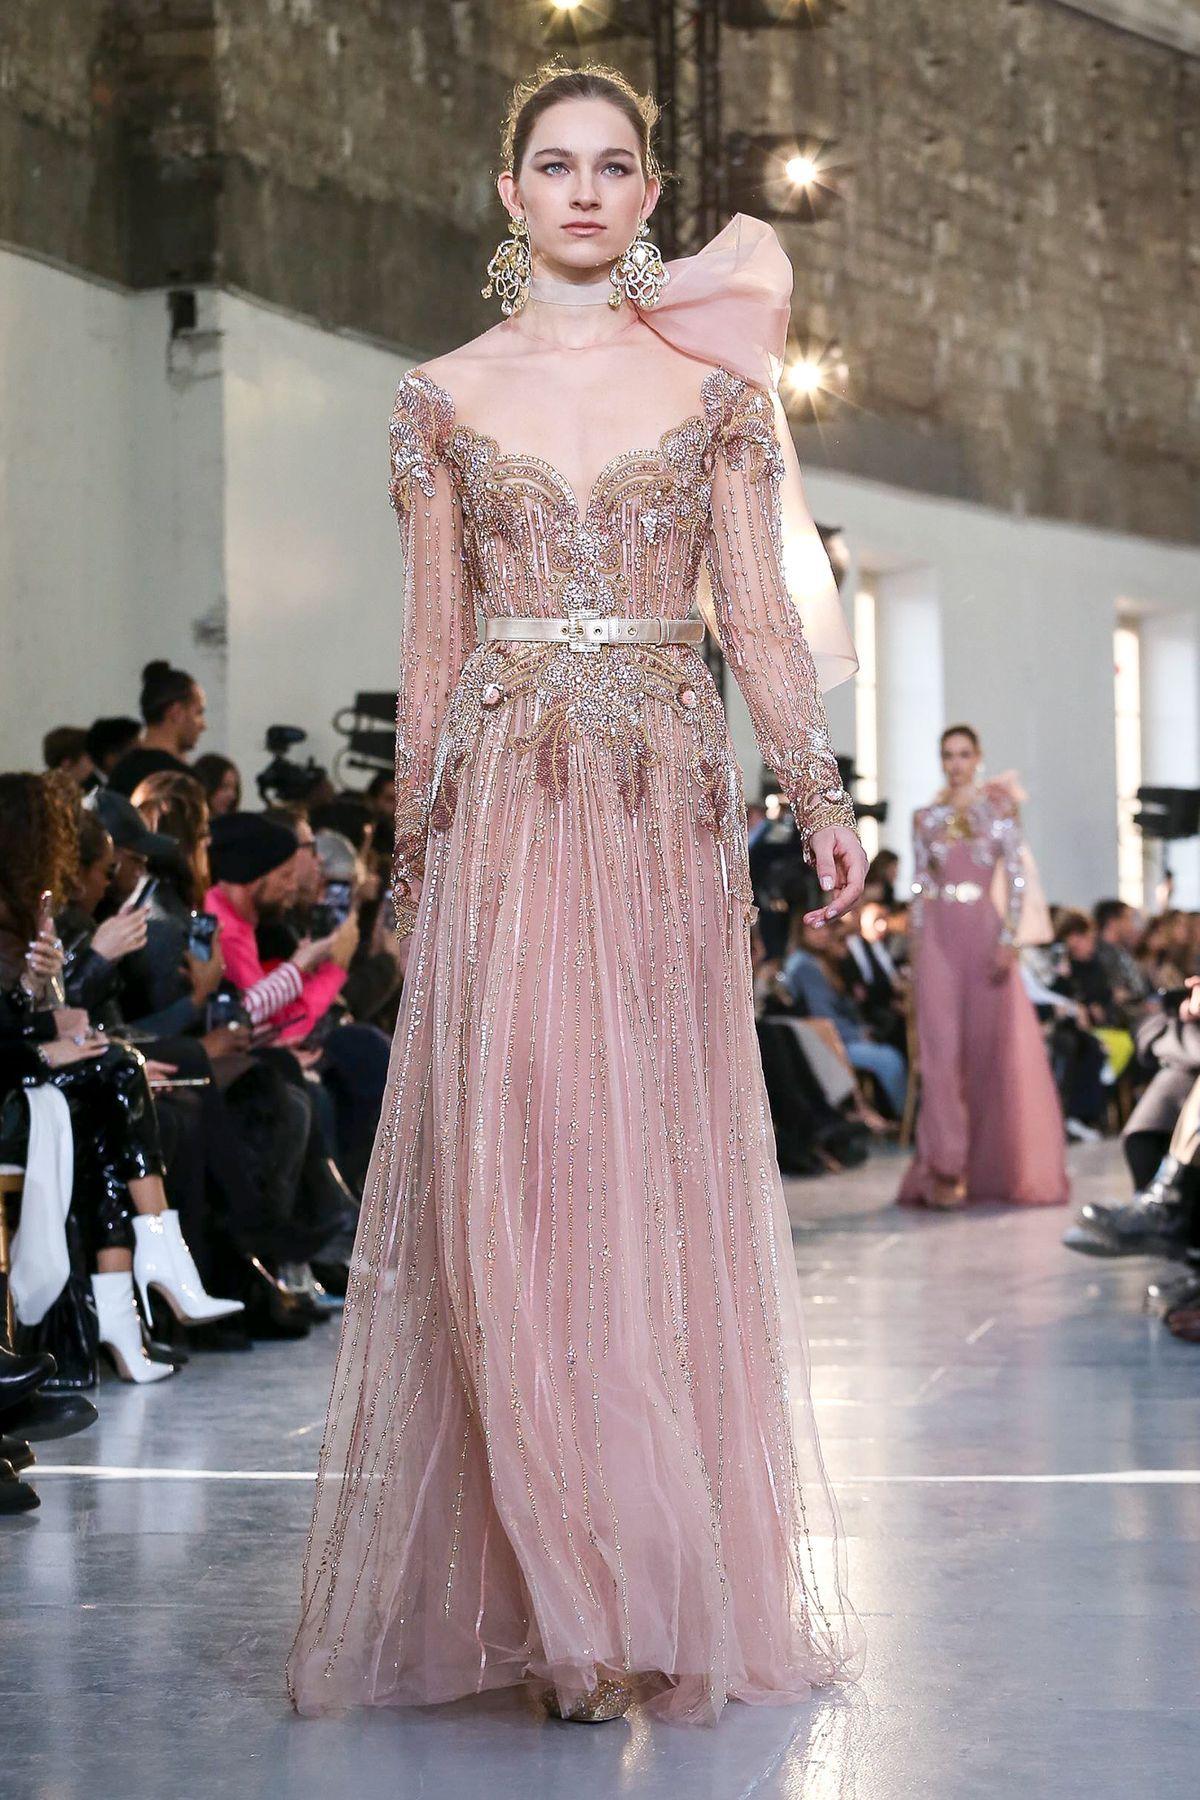 Elie Saab Haute Couture Spring Summer 18 Paris - NOWFASHION in